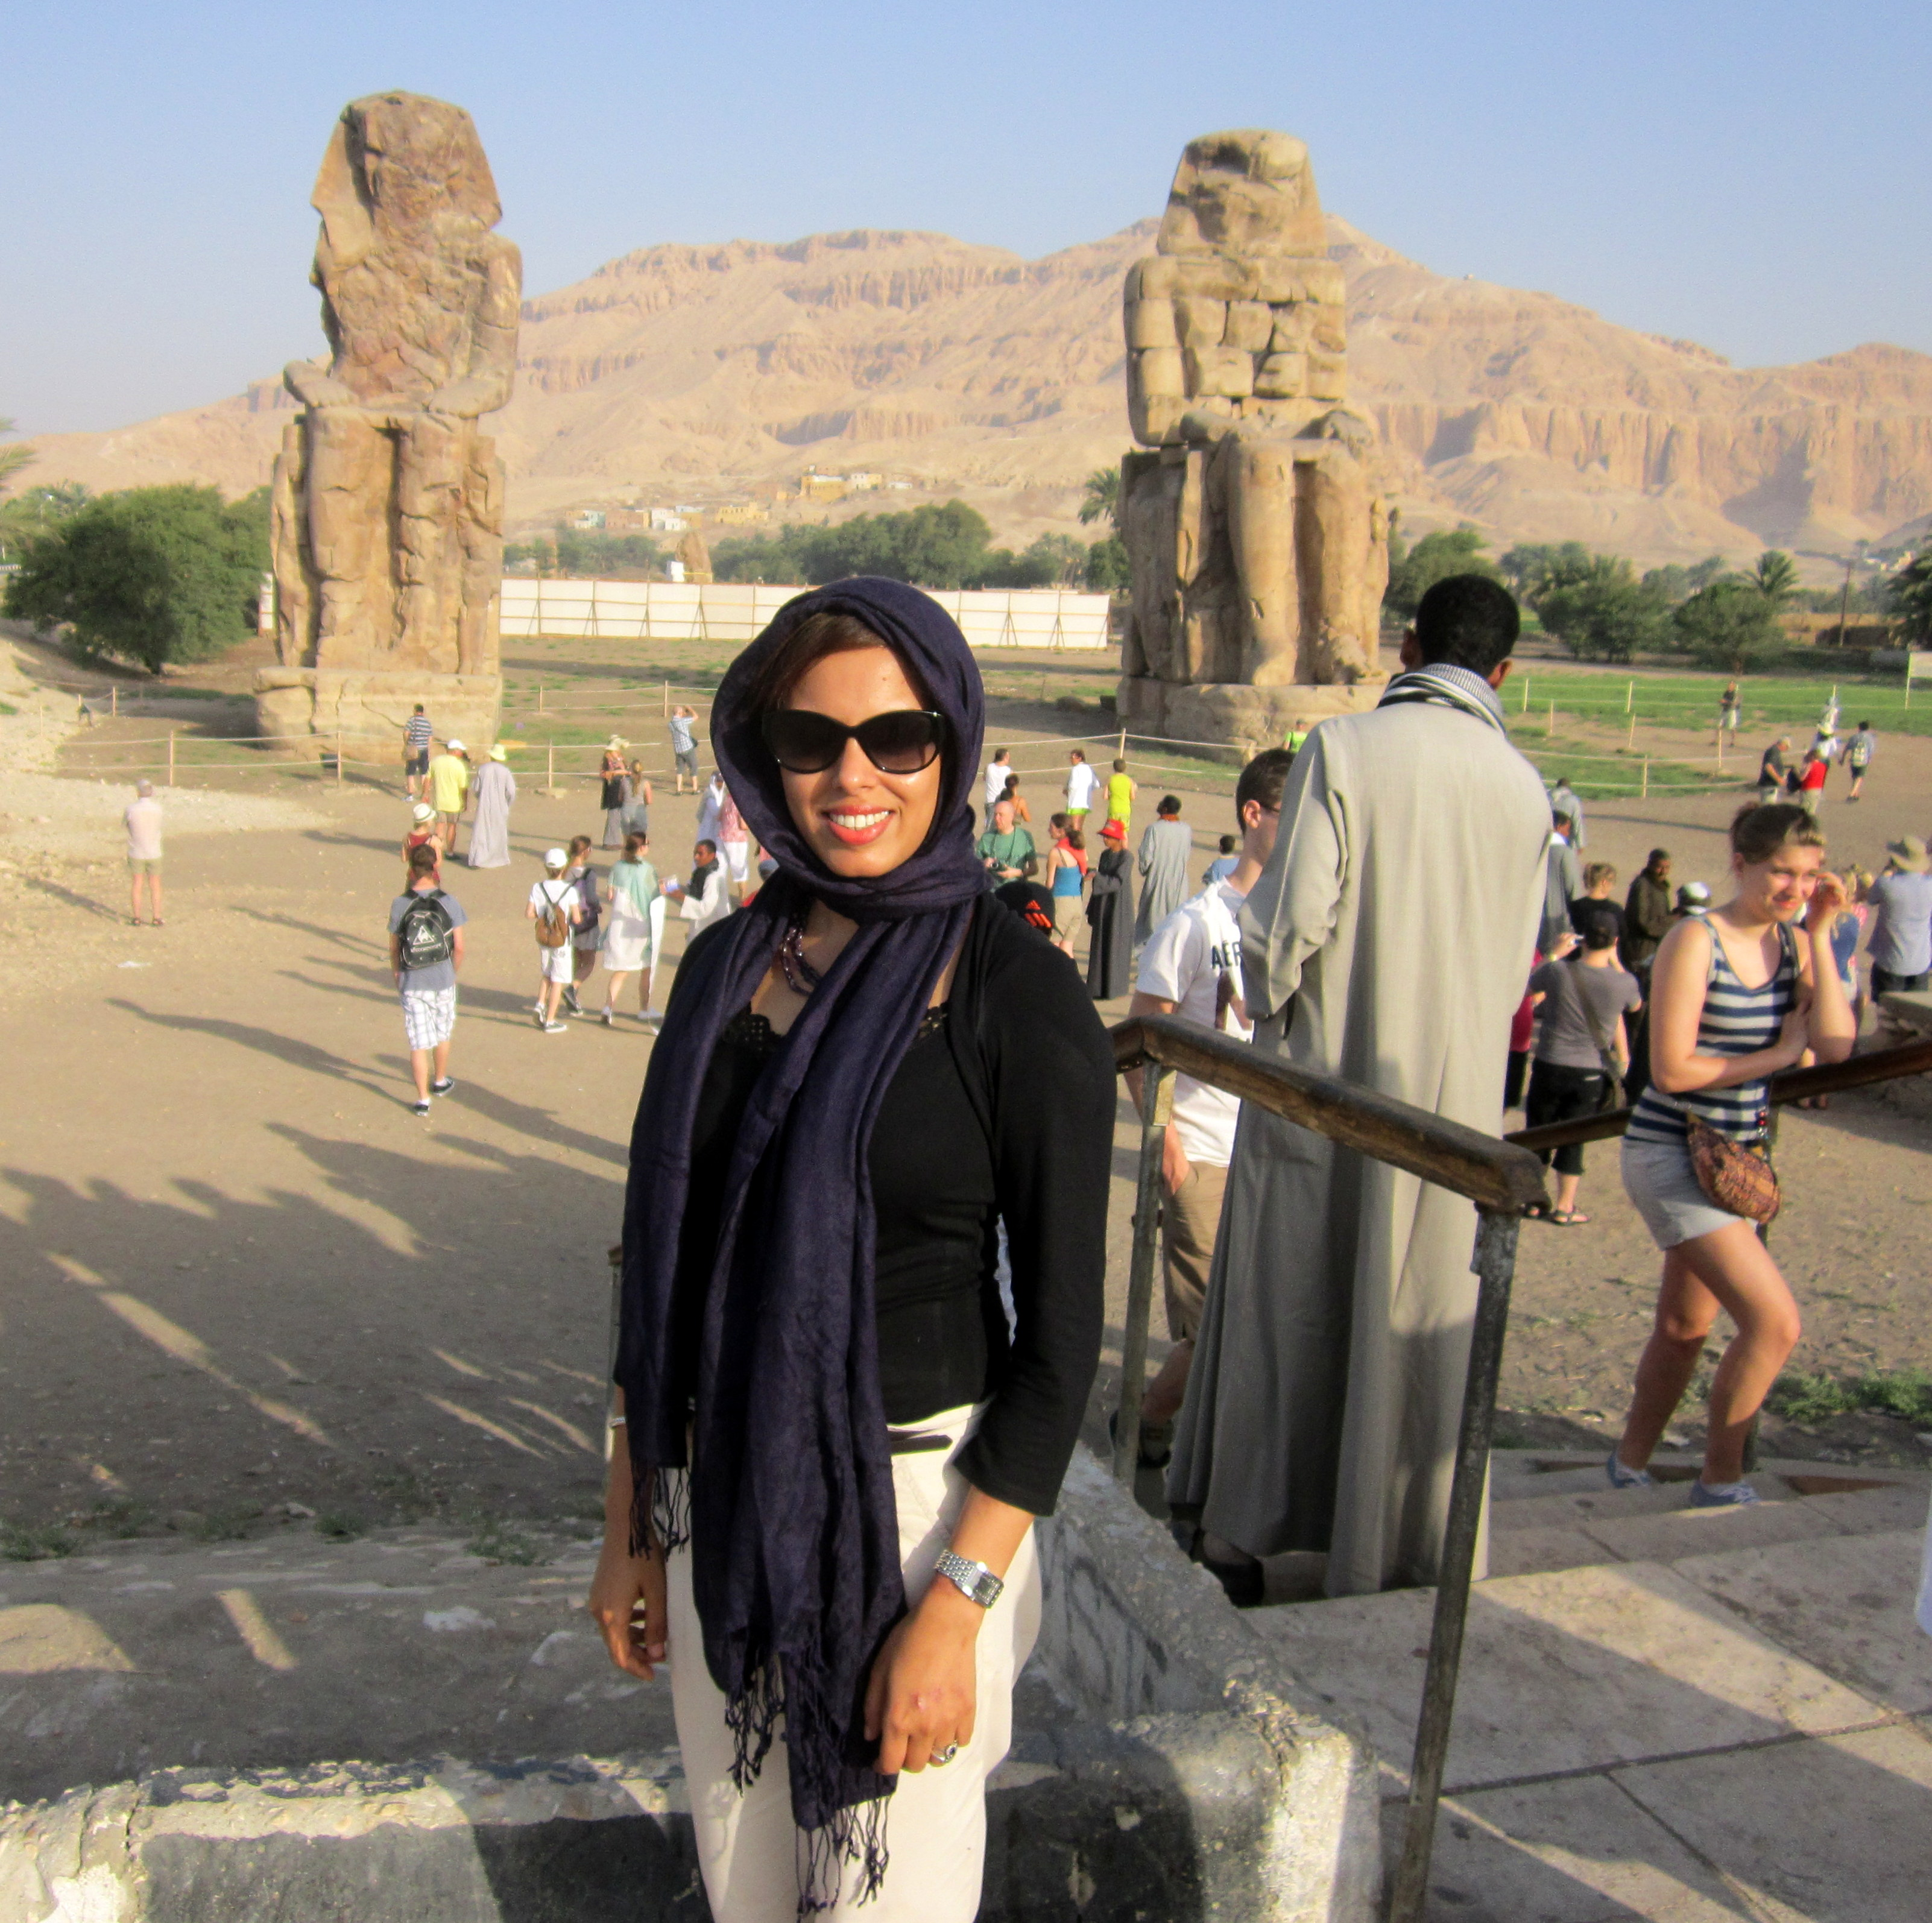 #egypt #egypttourism #luxor #luxortourism #luxorwestbank #colossiofmemnon